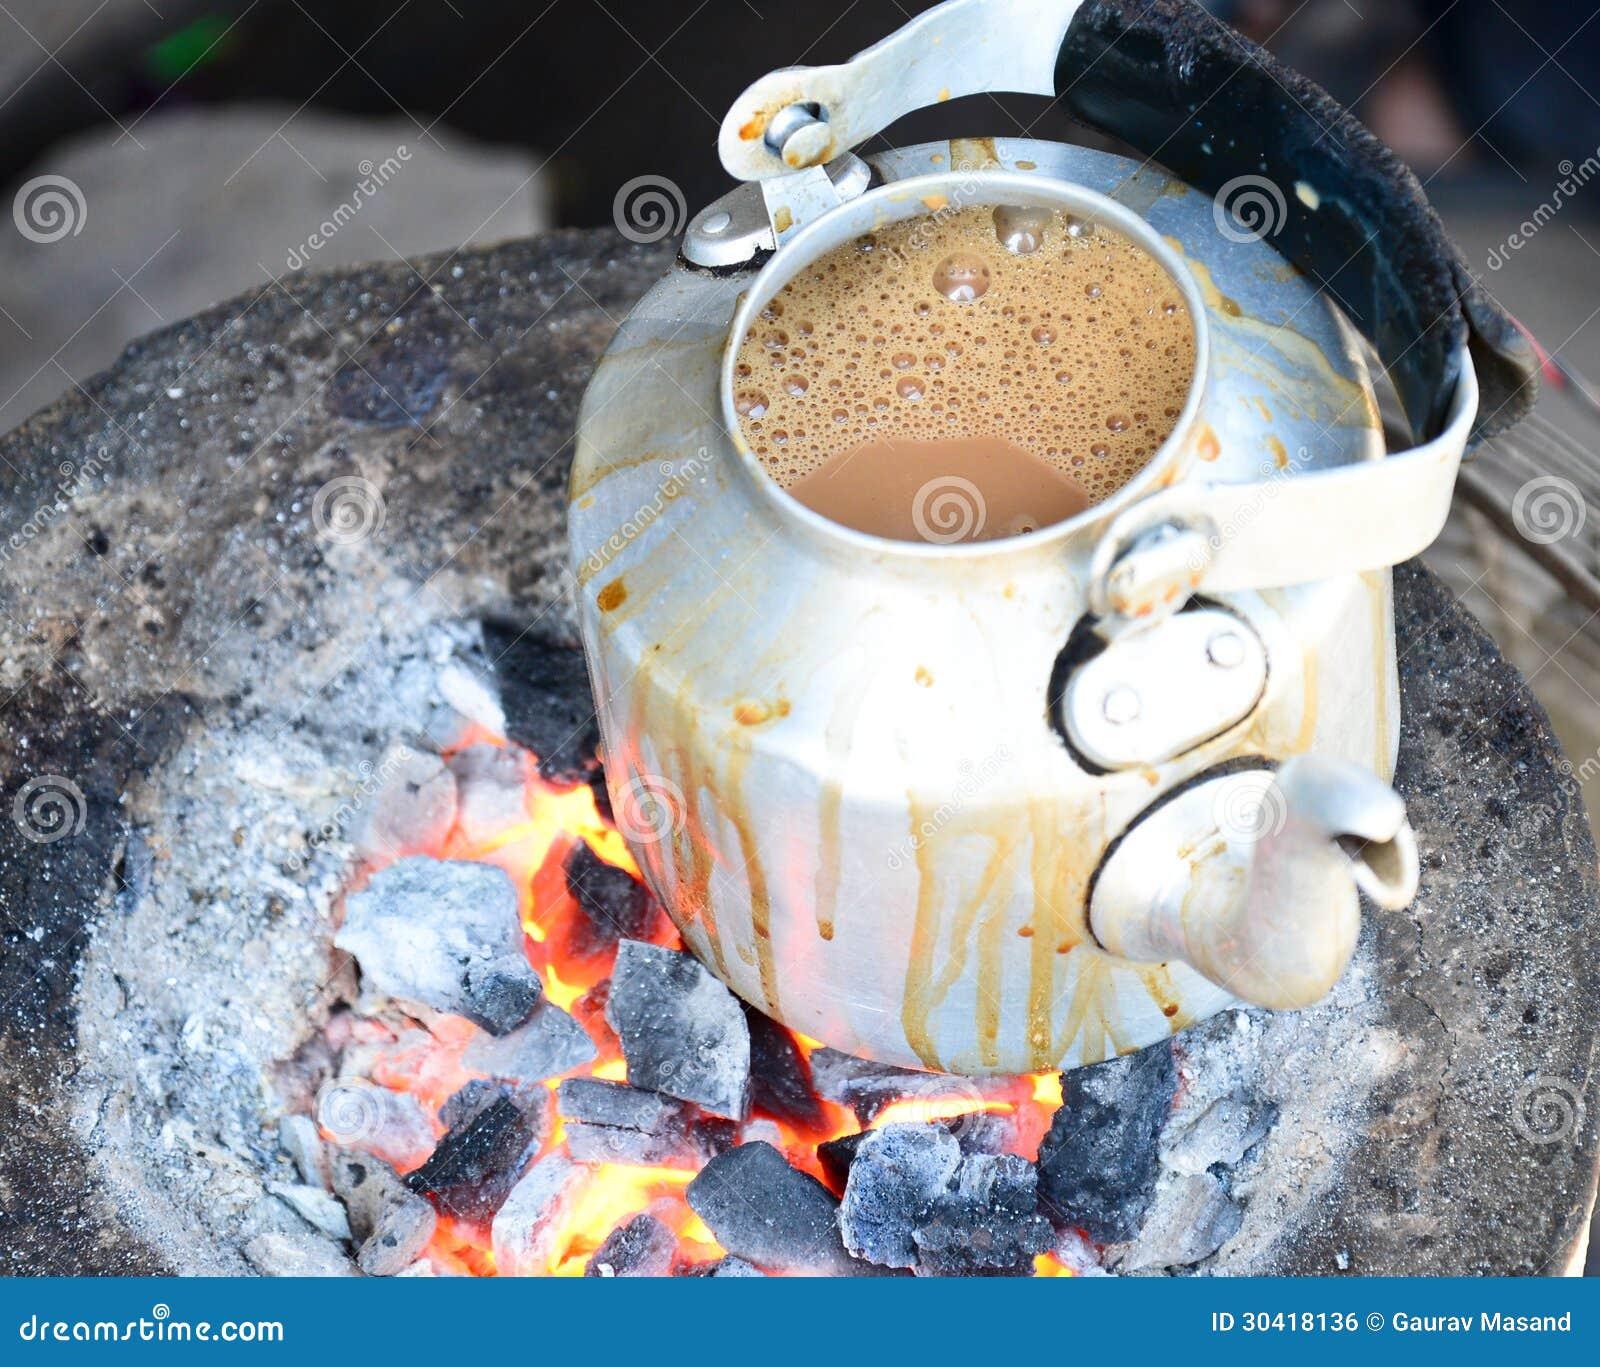 tea stall business plan